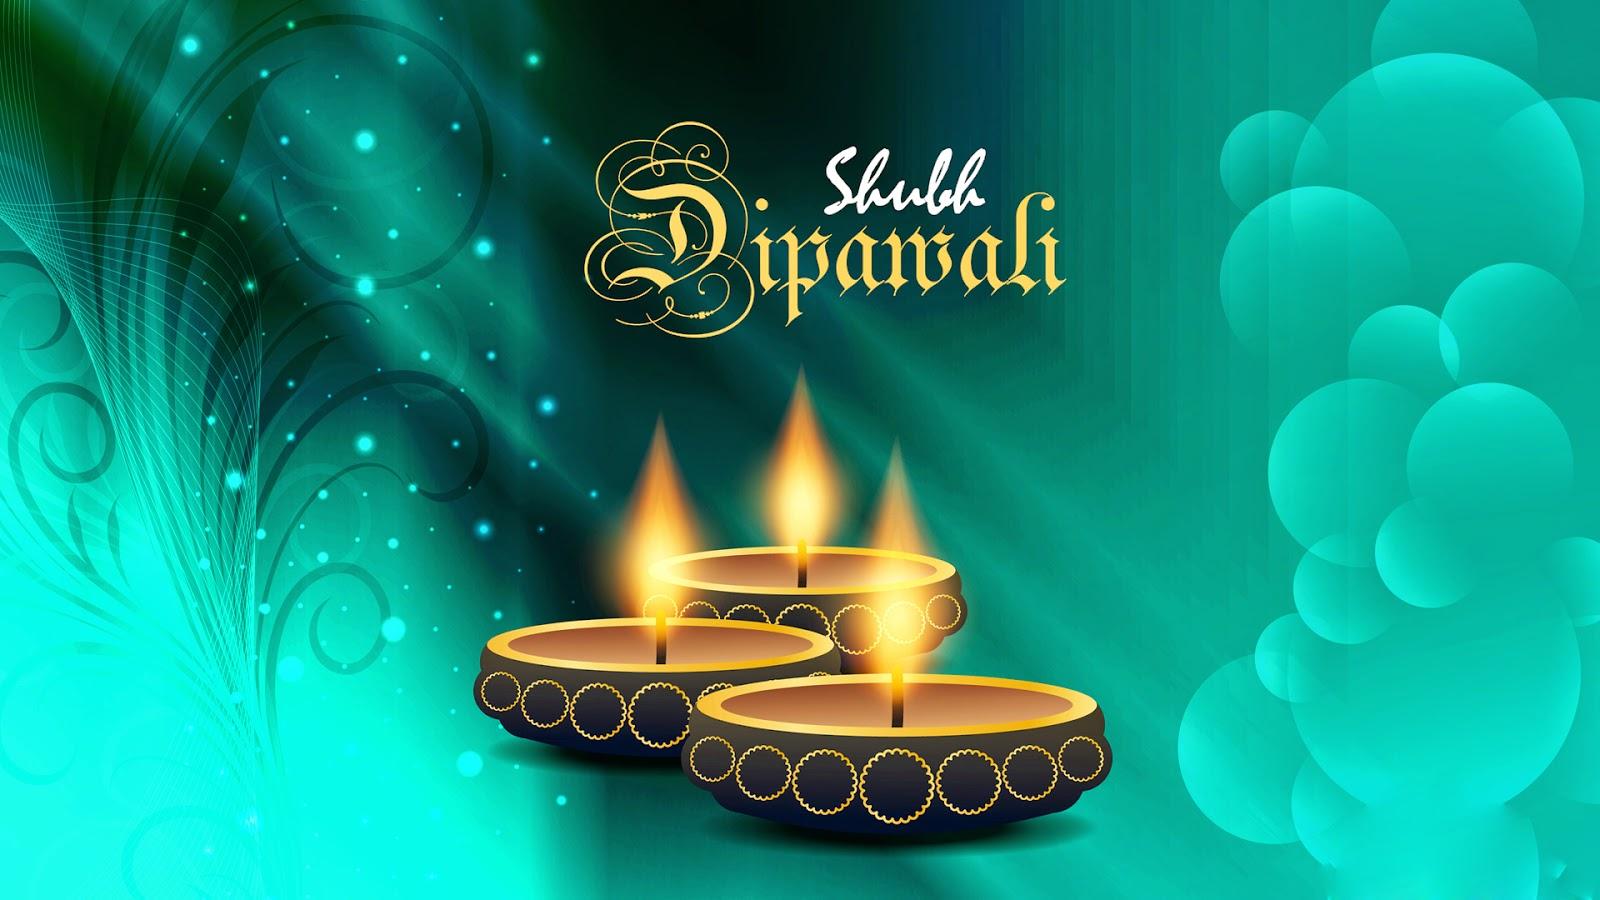 latest diwali images happy diwali images 2017 happy diwali